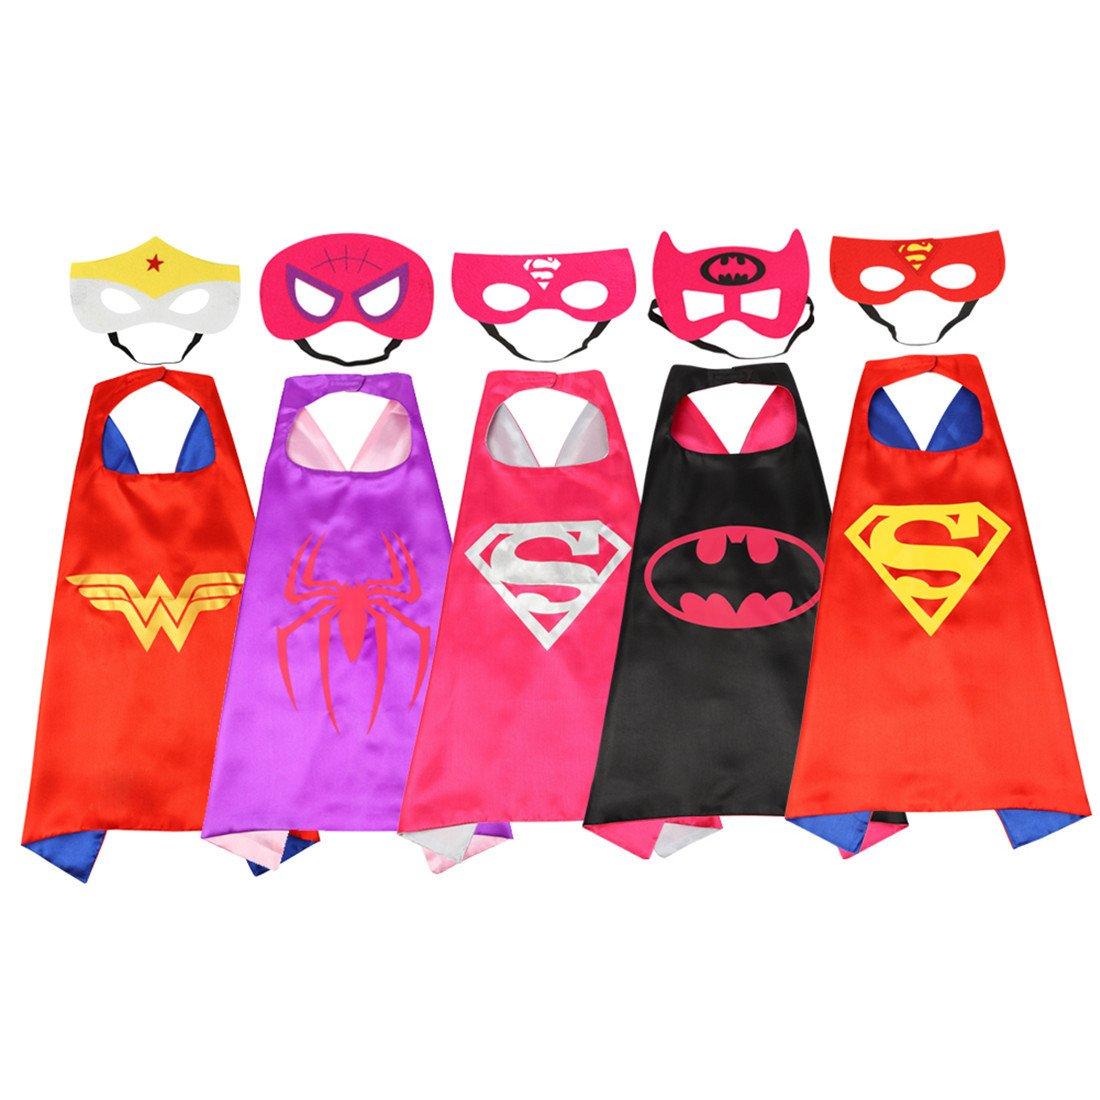 Zhitunemi Superhero Dress Up Costumes for Boys and Girls 5 Satin Capes with Felt Masks Comics Cartoon Dress Up